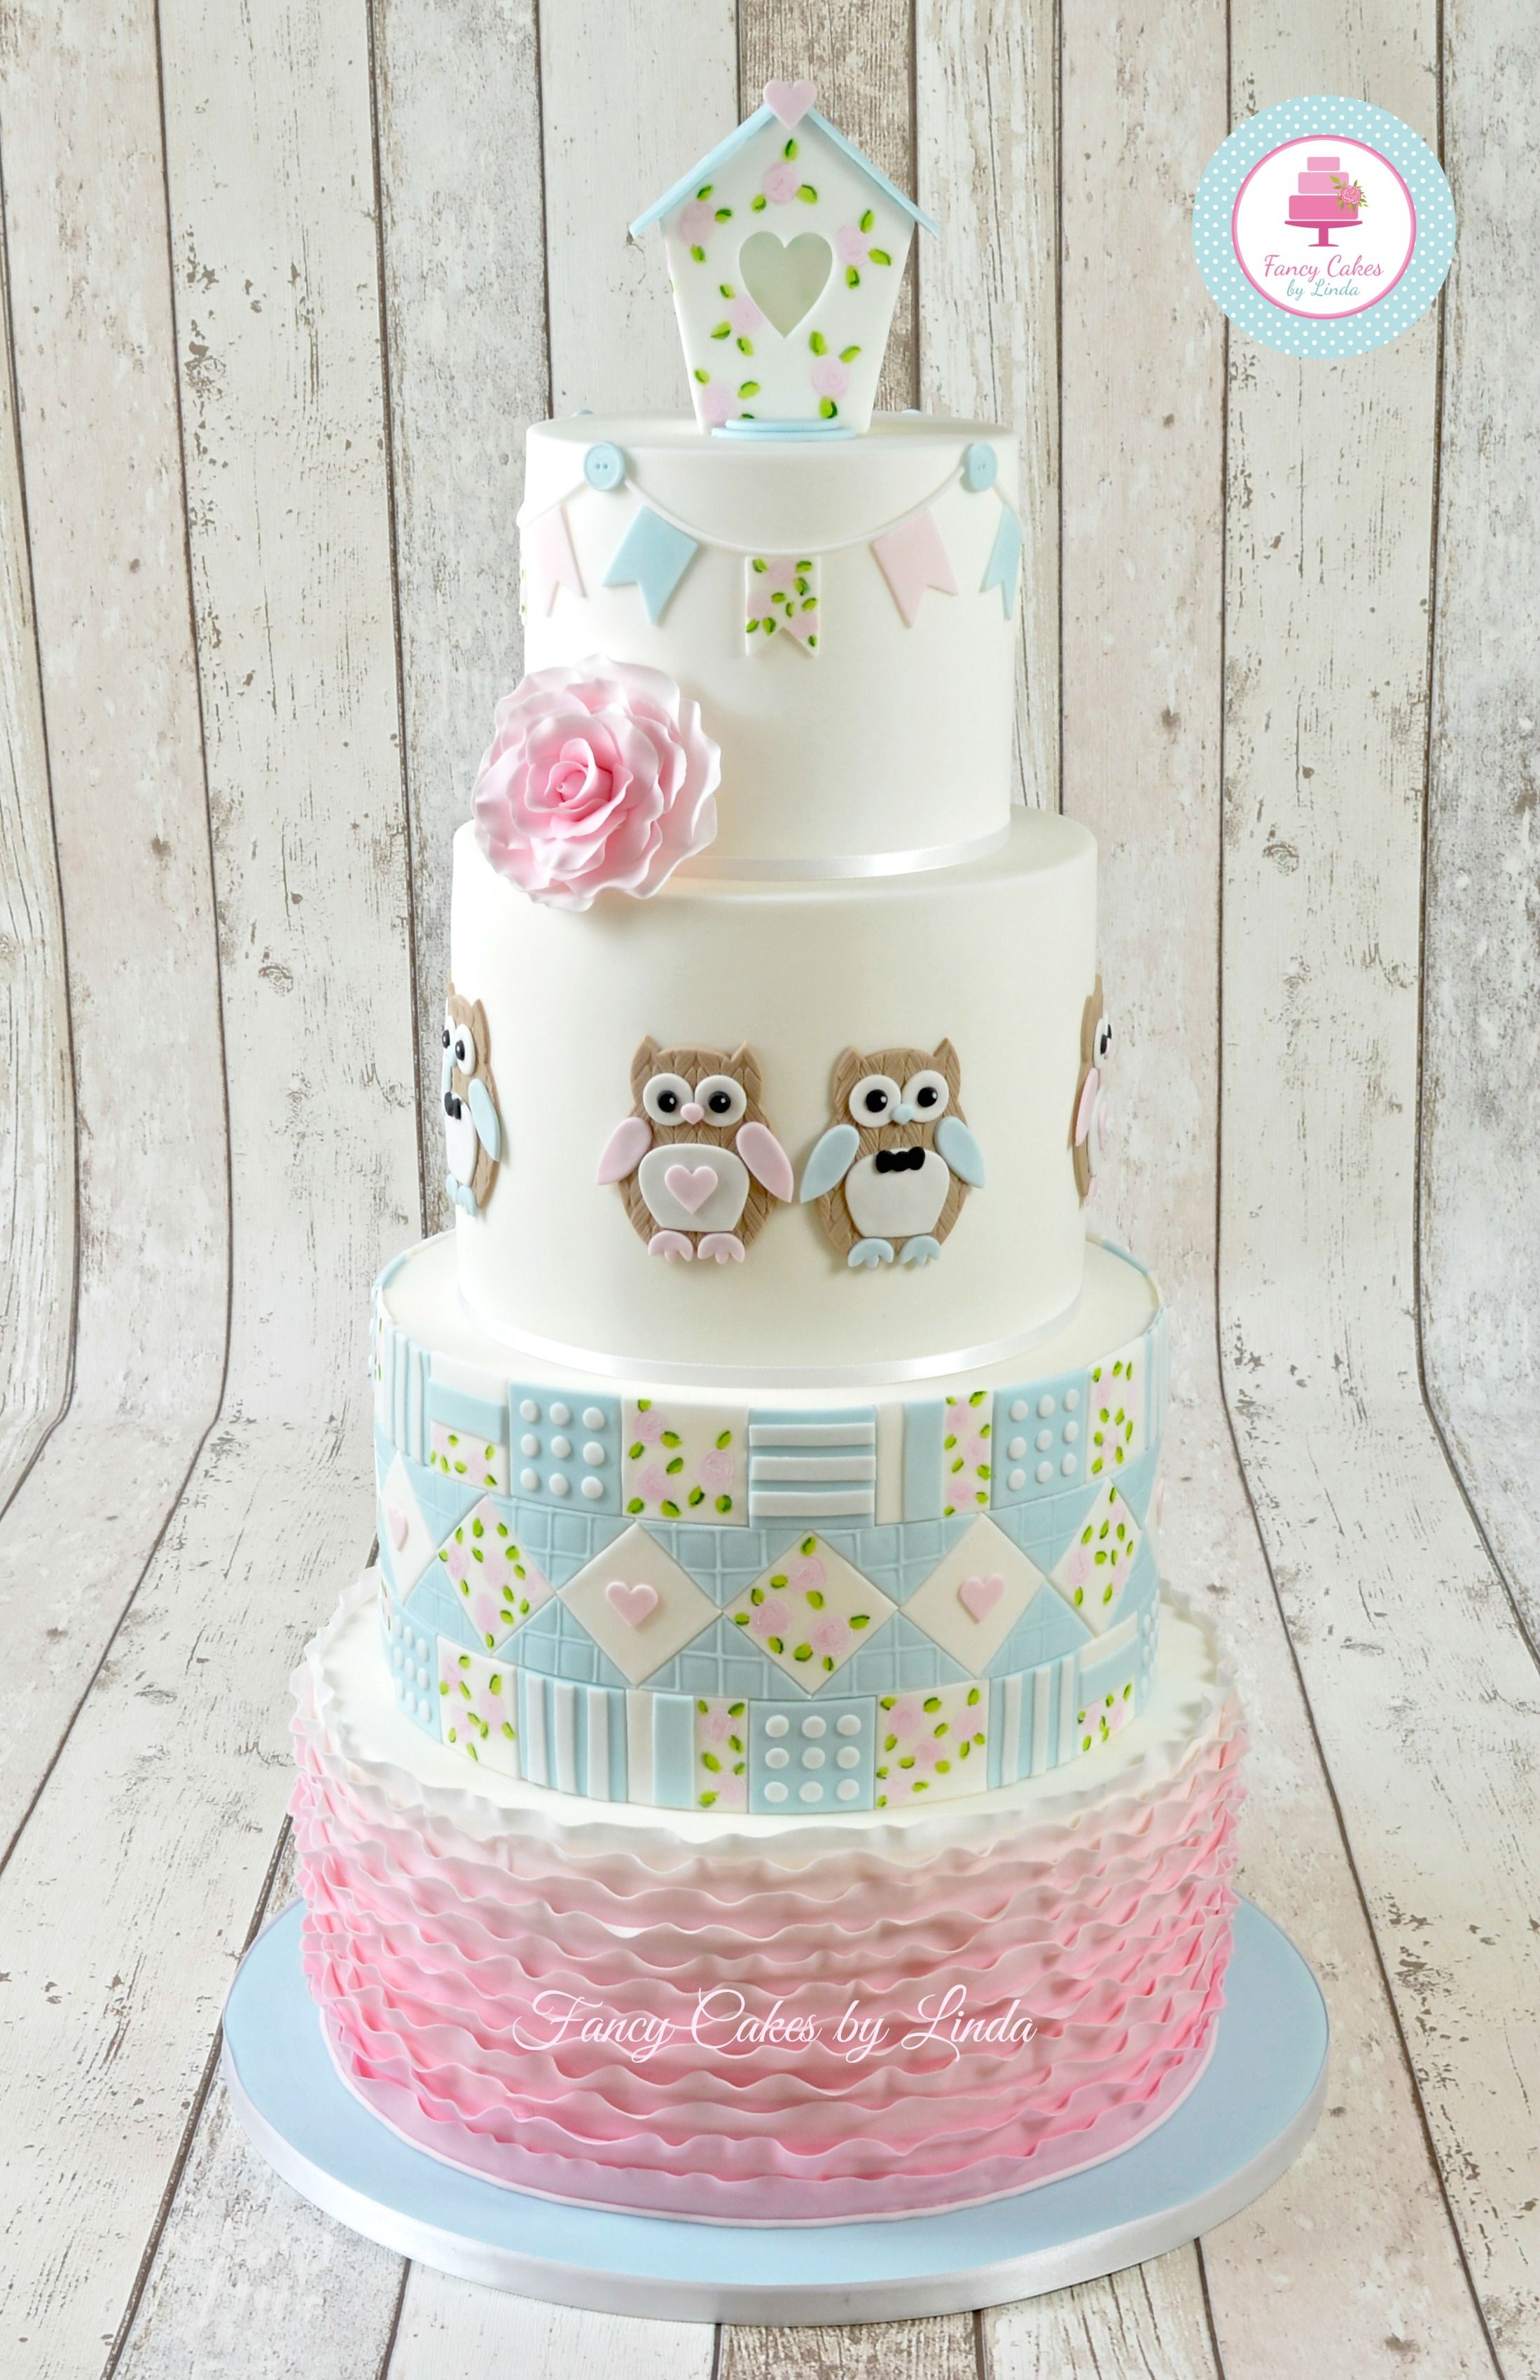 Mummy and Baby Owl Cutter Set Cake Decorating Sugarcraft Cutter FMM Sugarcraft